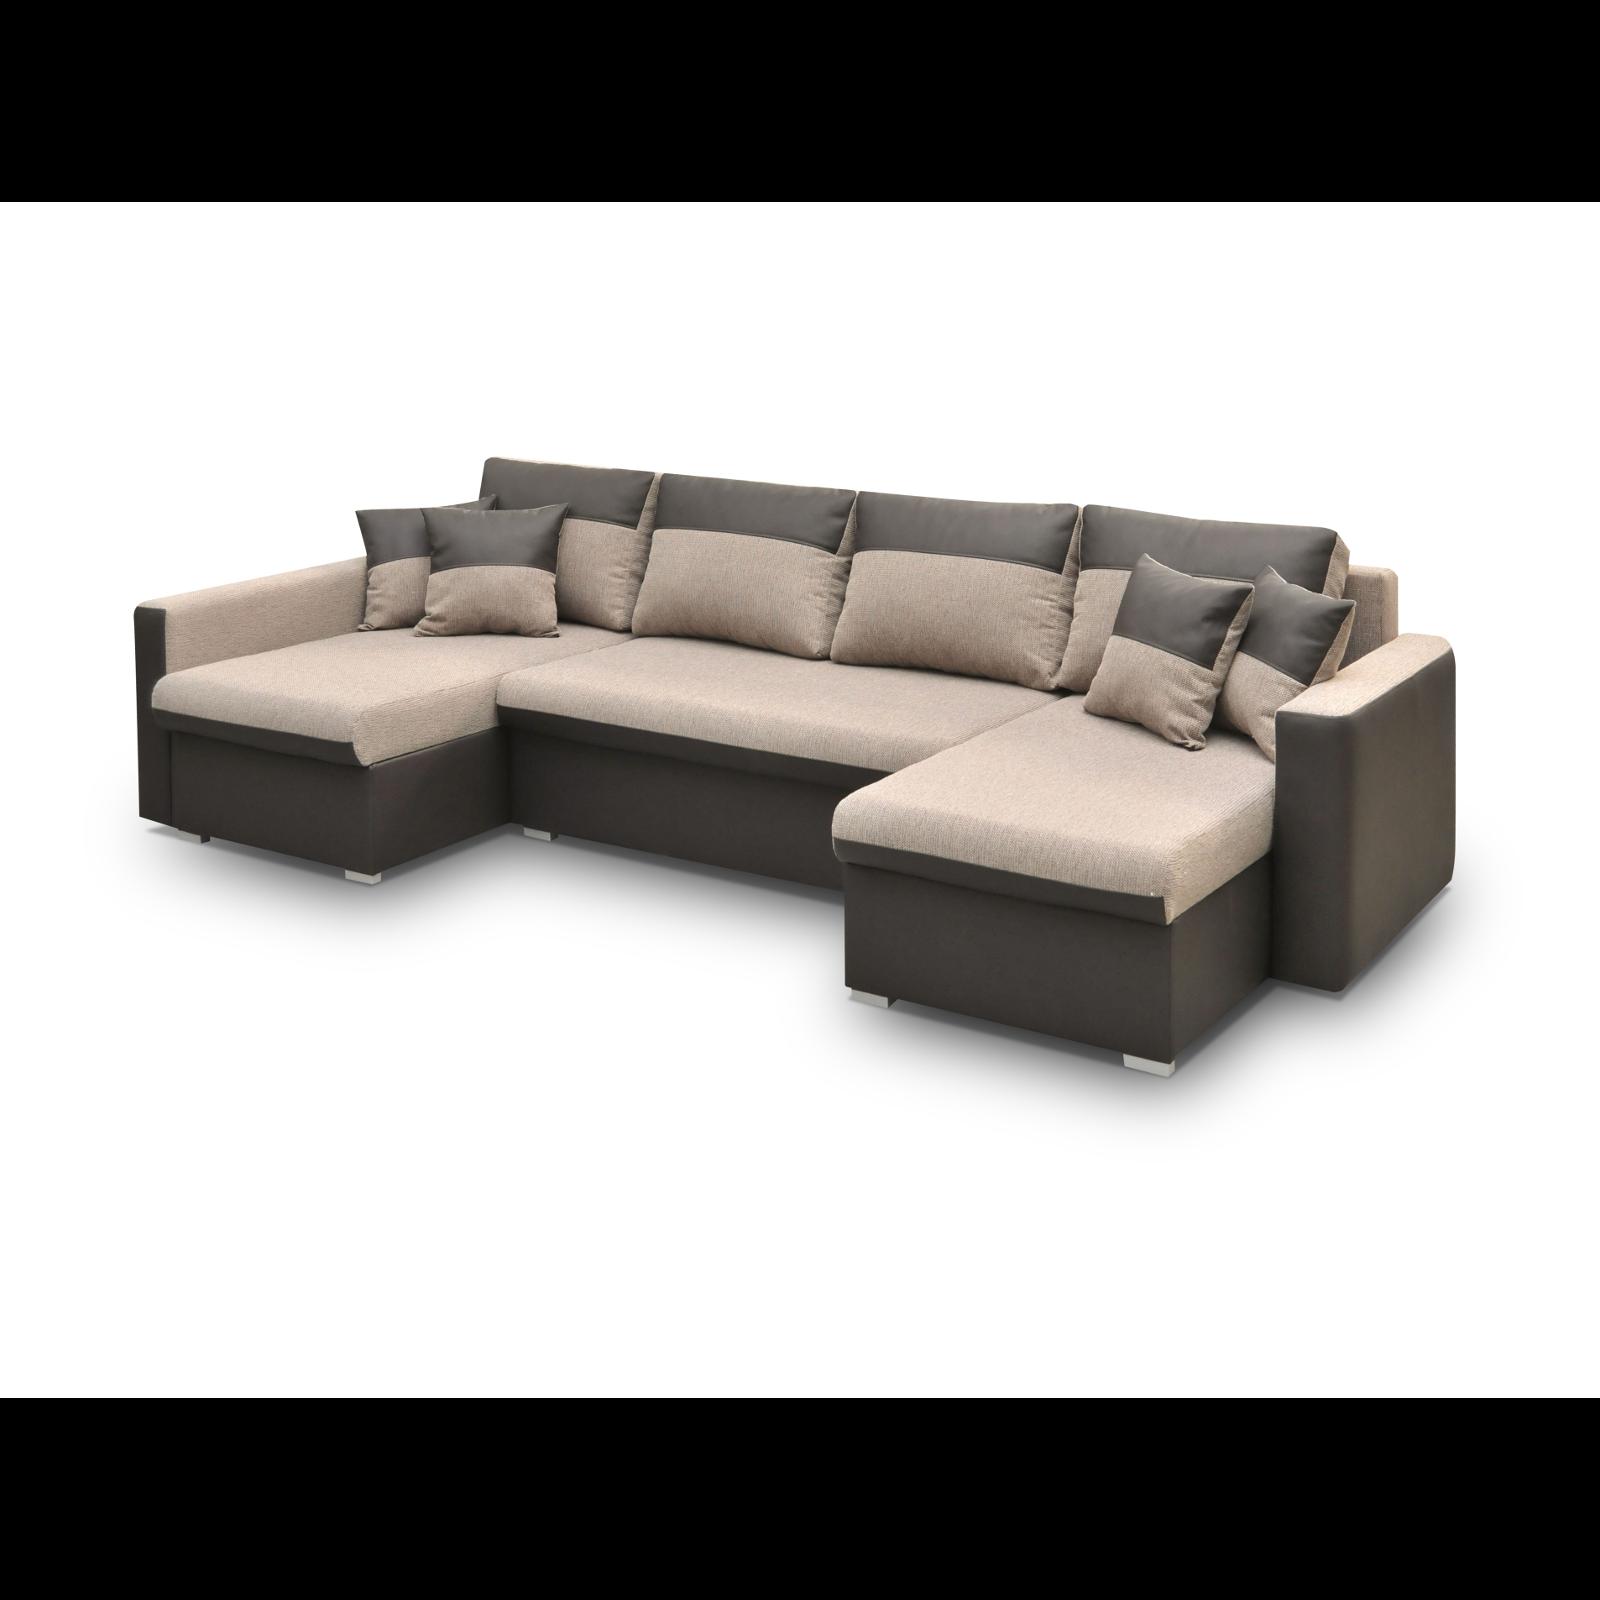 ecksofa berlin u braun m bel muller braun. Black Bedroom Furniture Sets. Home Design Ideas